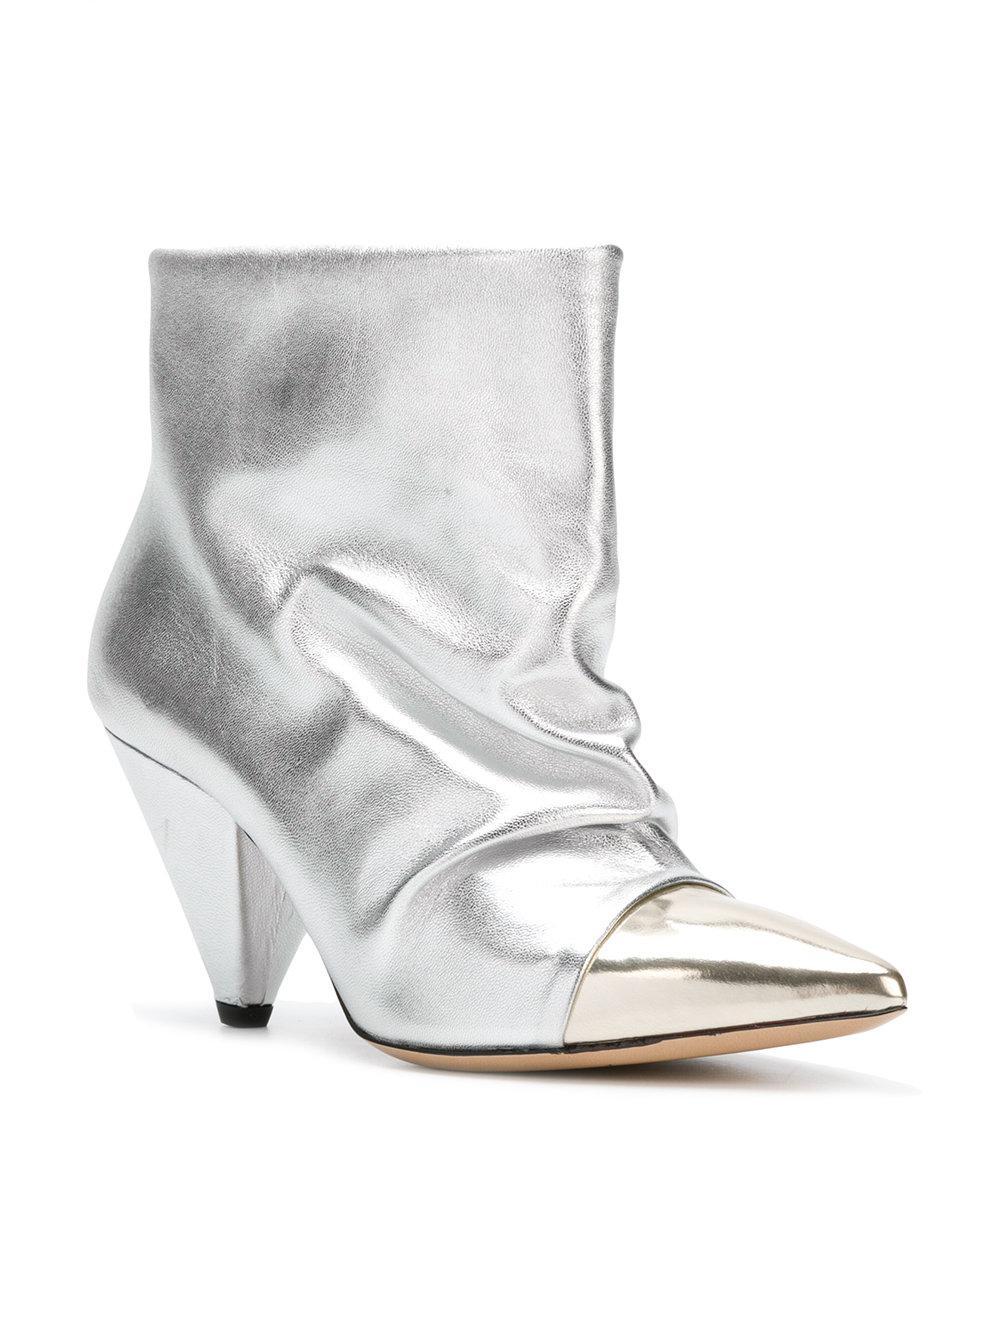 contrast-toe pointed boots - Metallic Marc Ellis QGqIad2J